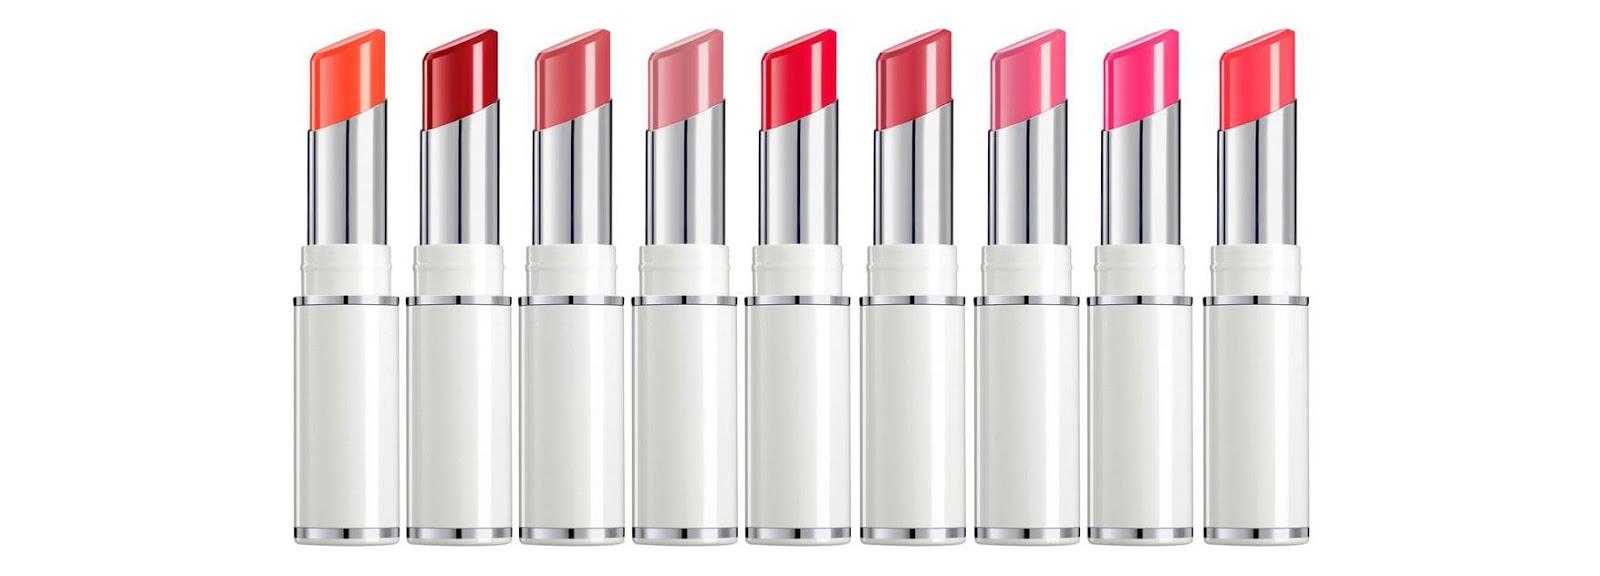 Lancome shine lover lipstick, Lancome shine lover lipsticks